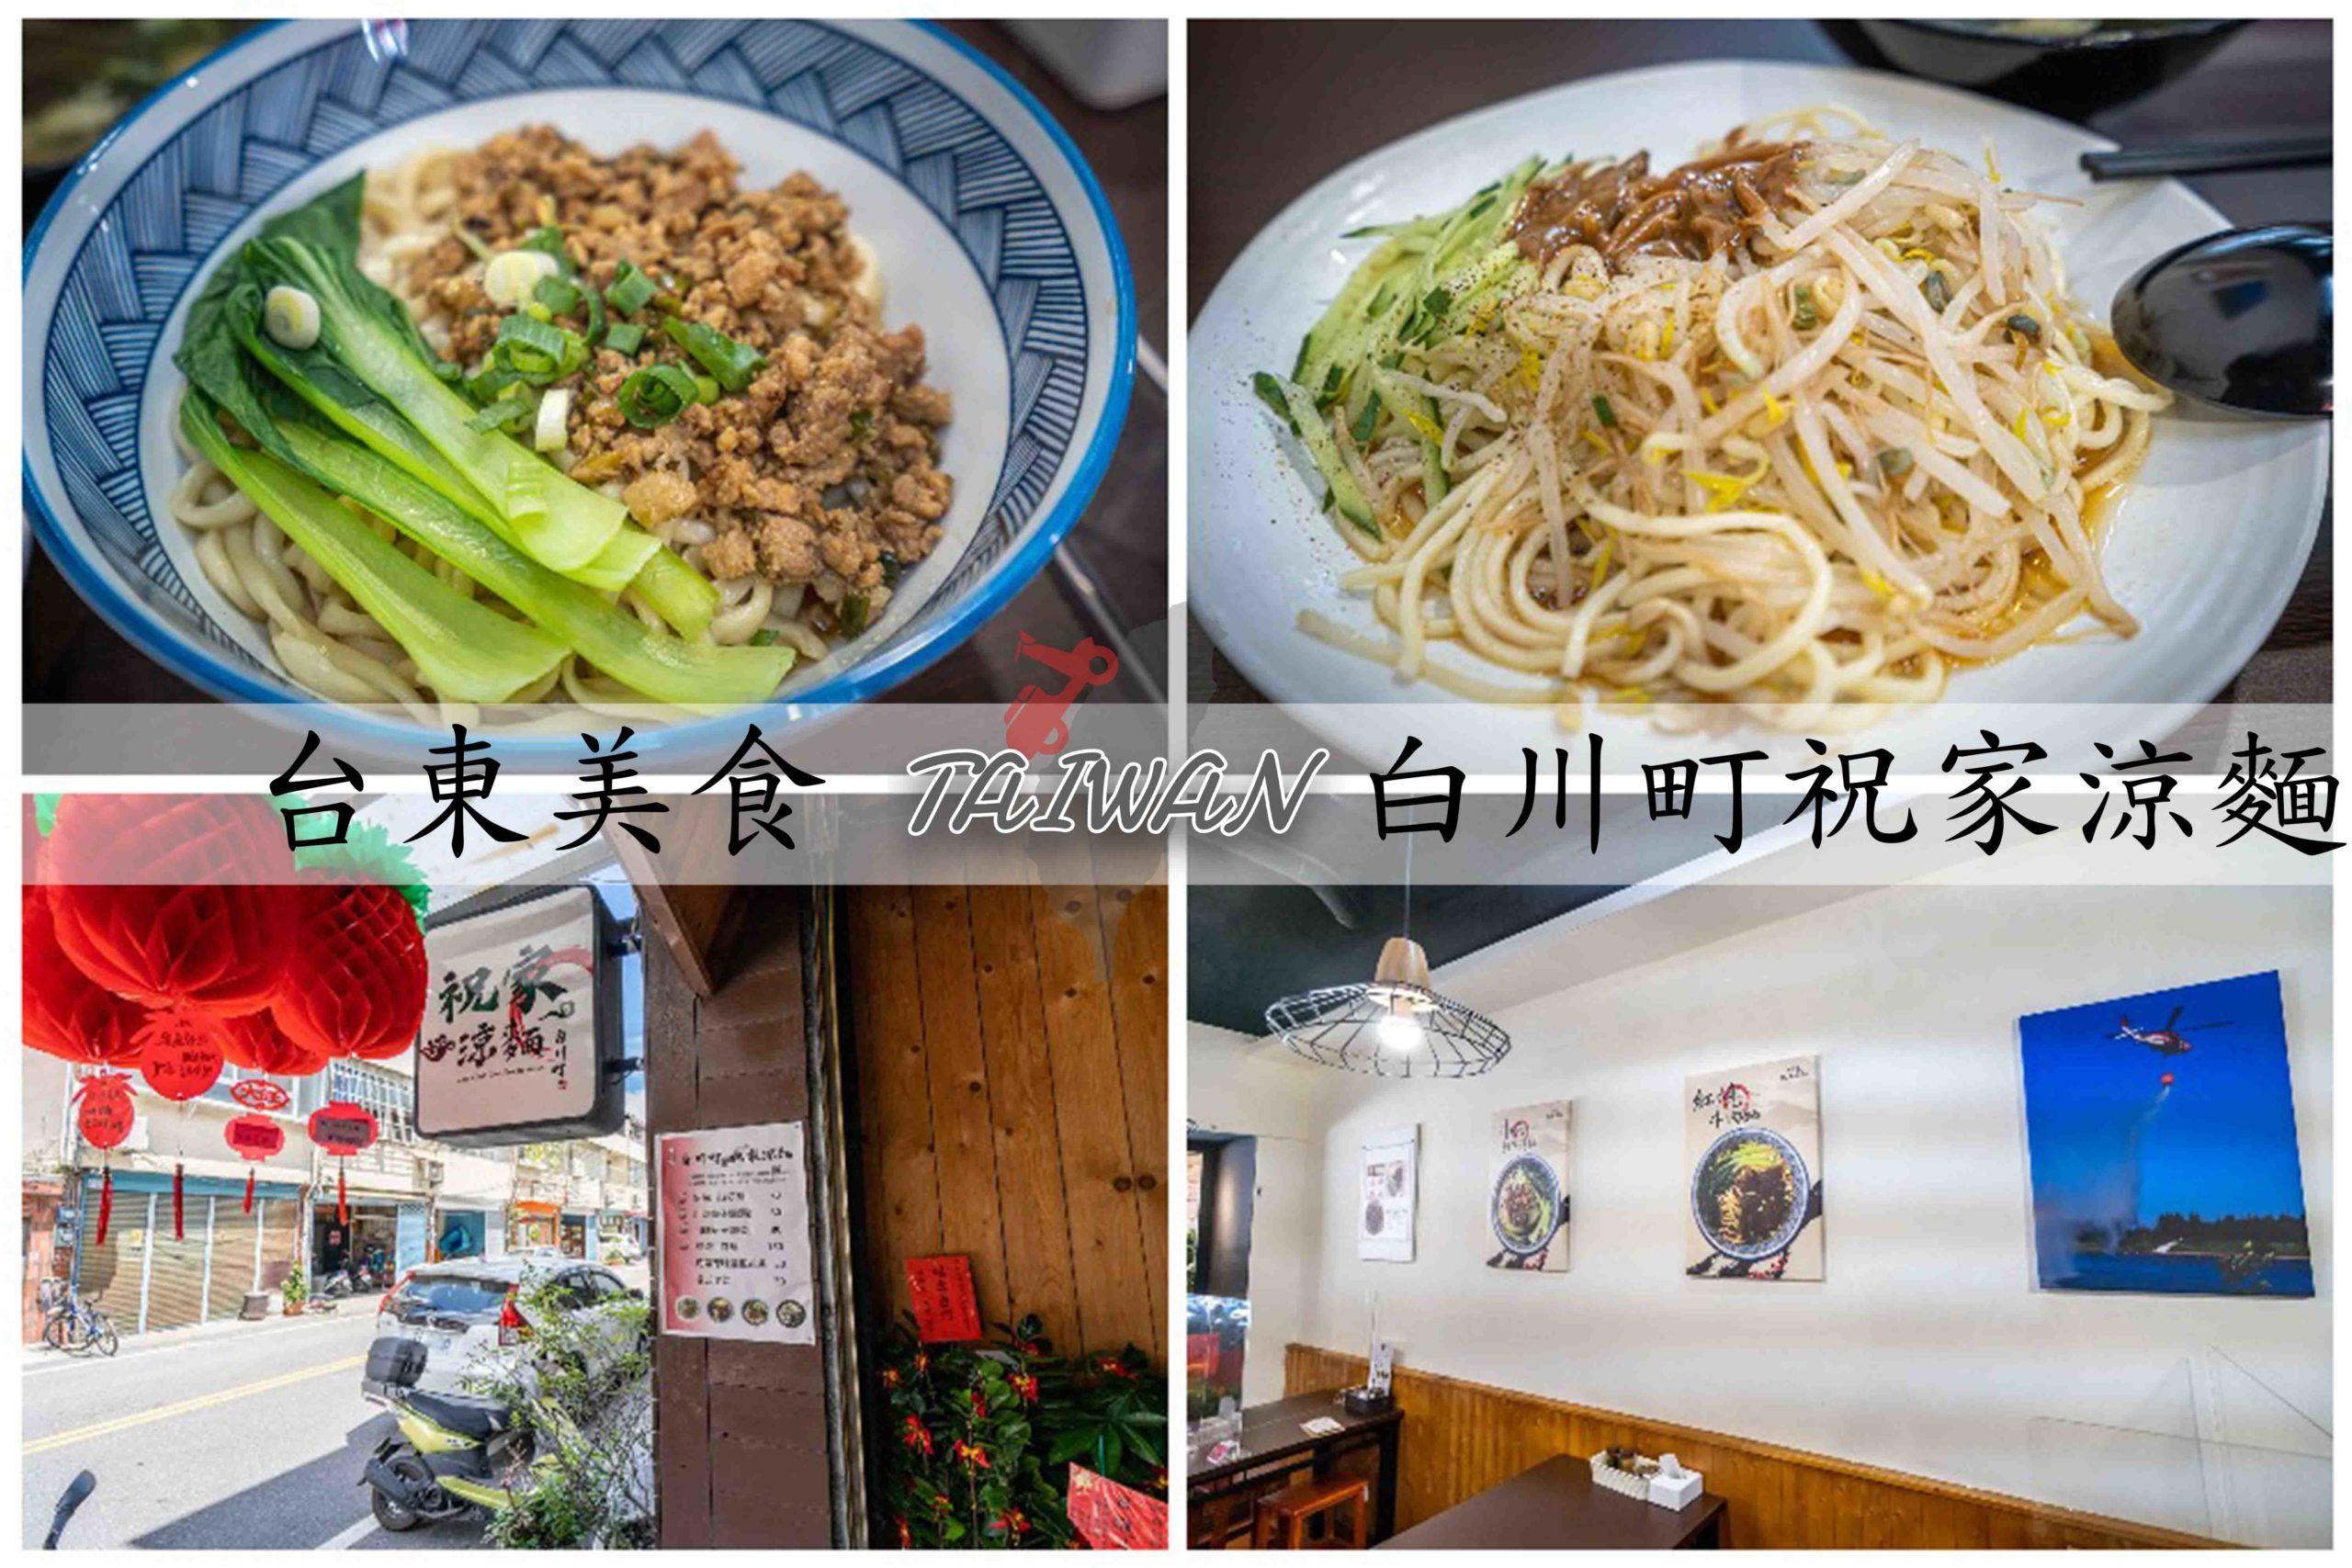 Read more about the article 台東涼麵推薦,香濃麻醬蒜味超過癮,白川町-祝家涼麵